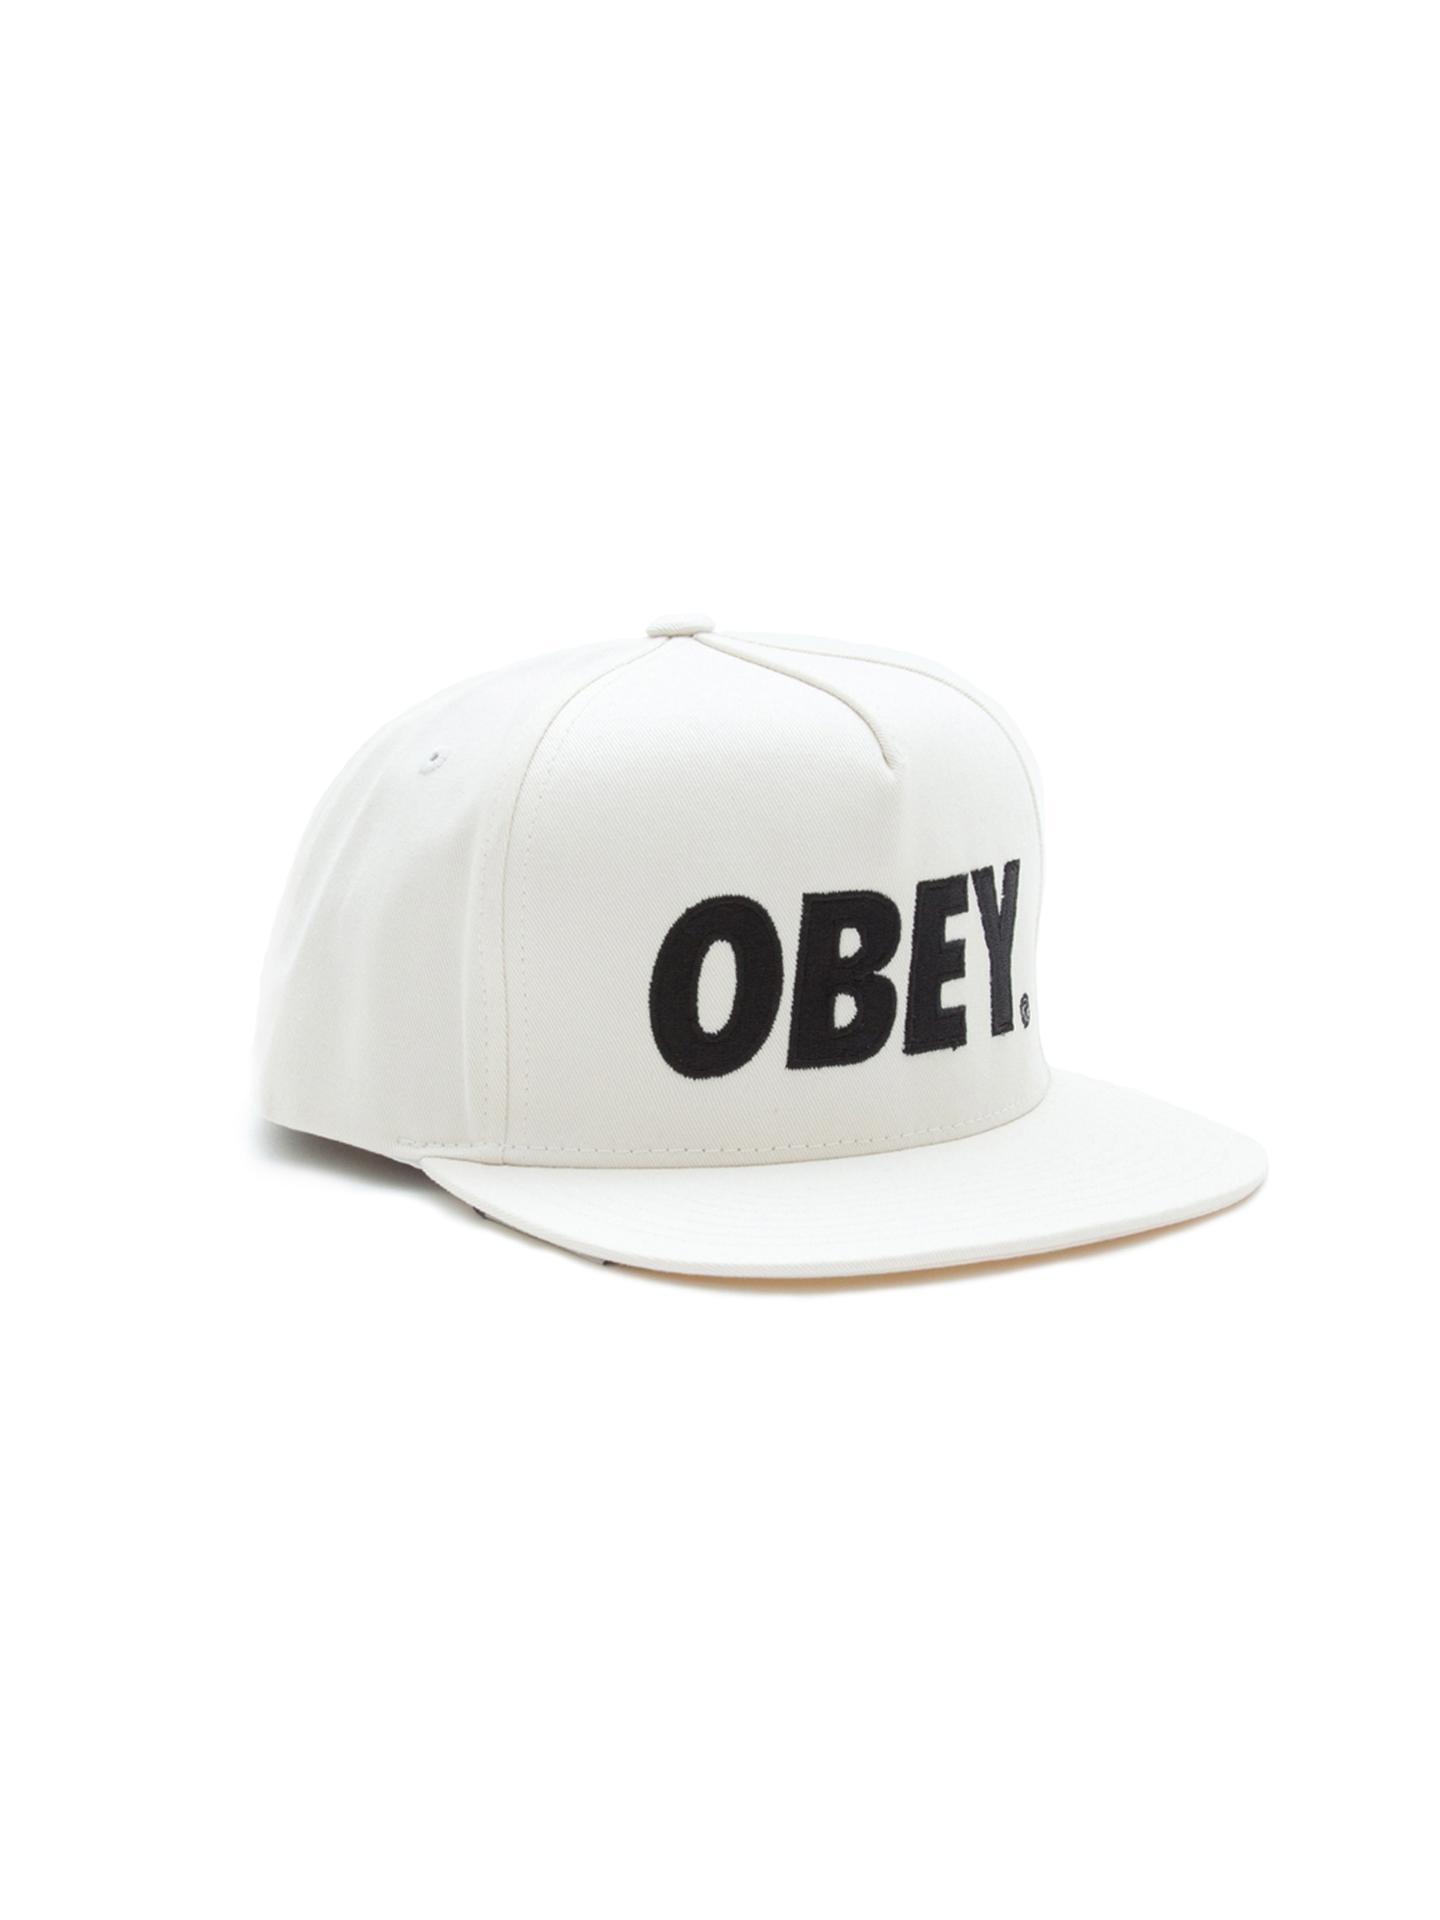 64b6af1dc8b The City Snapback Hat - Obey Clothing UK